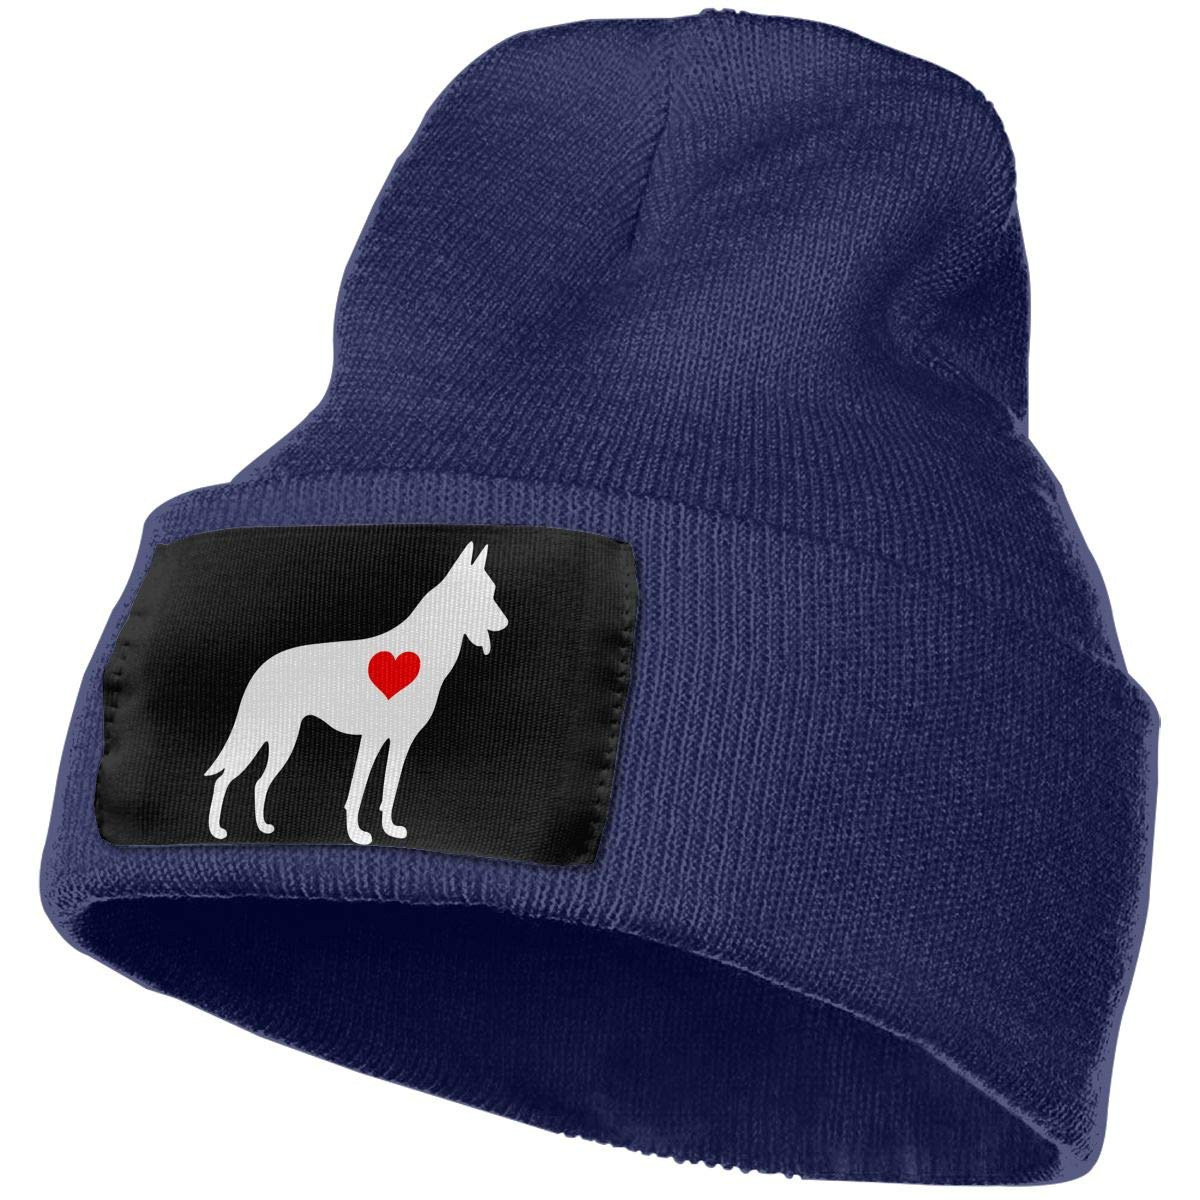 German Shepherd Heart-1 Men /& Women Knit Hats Stretchy /& Soft Beanie Cap Hat Beanie